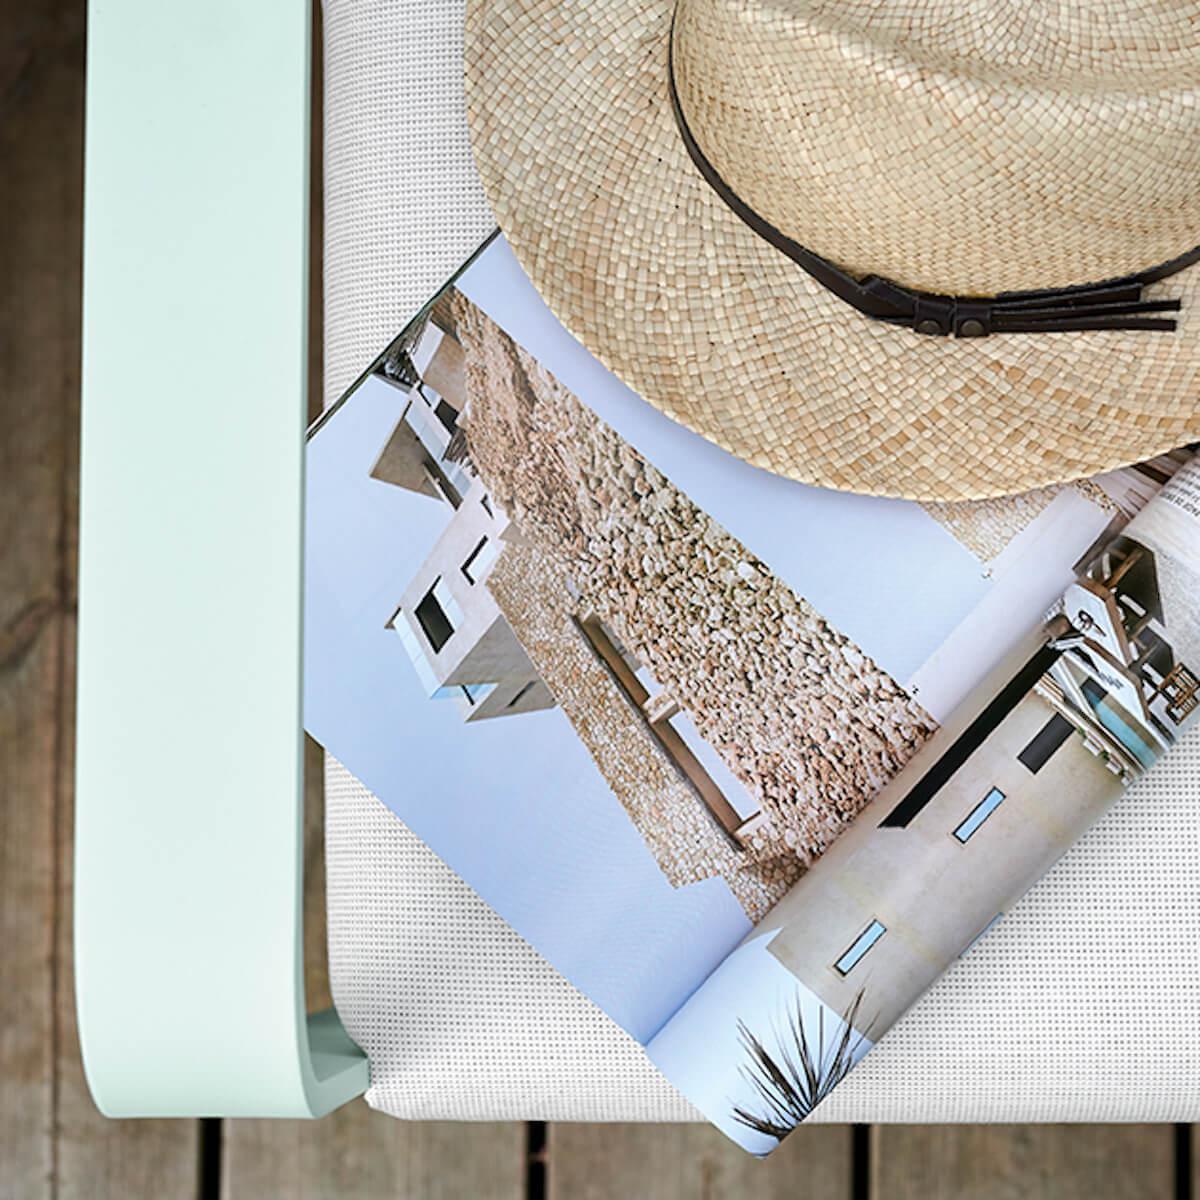 Fauteuil de jardin BELLEVIE Fermob muscade-blanc grisé